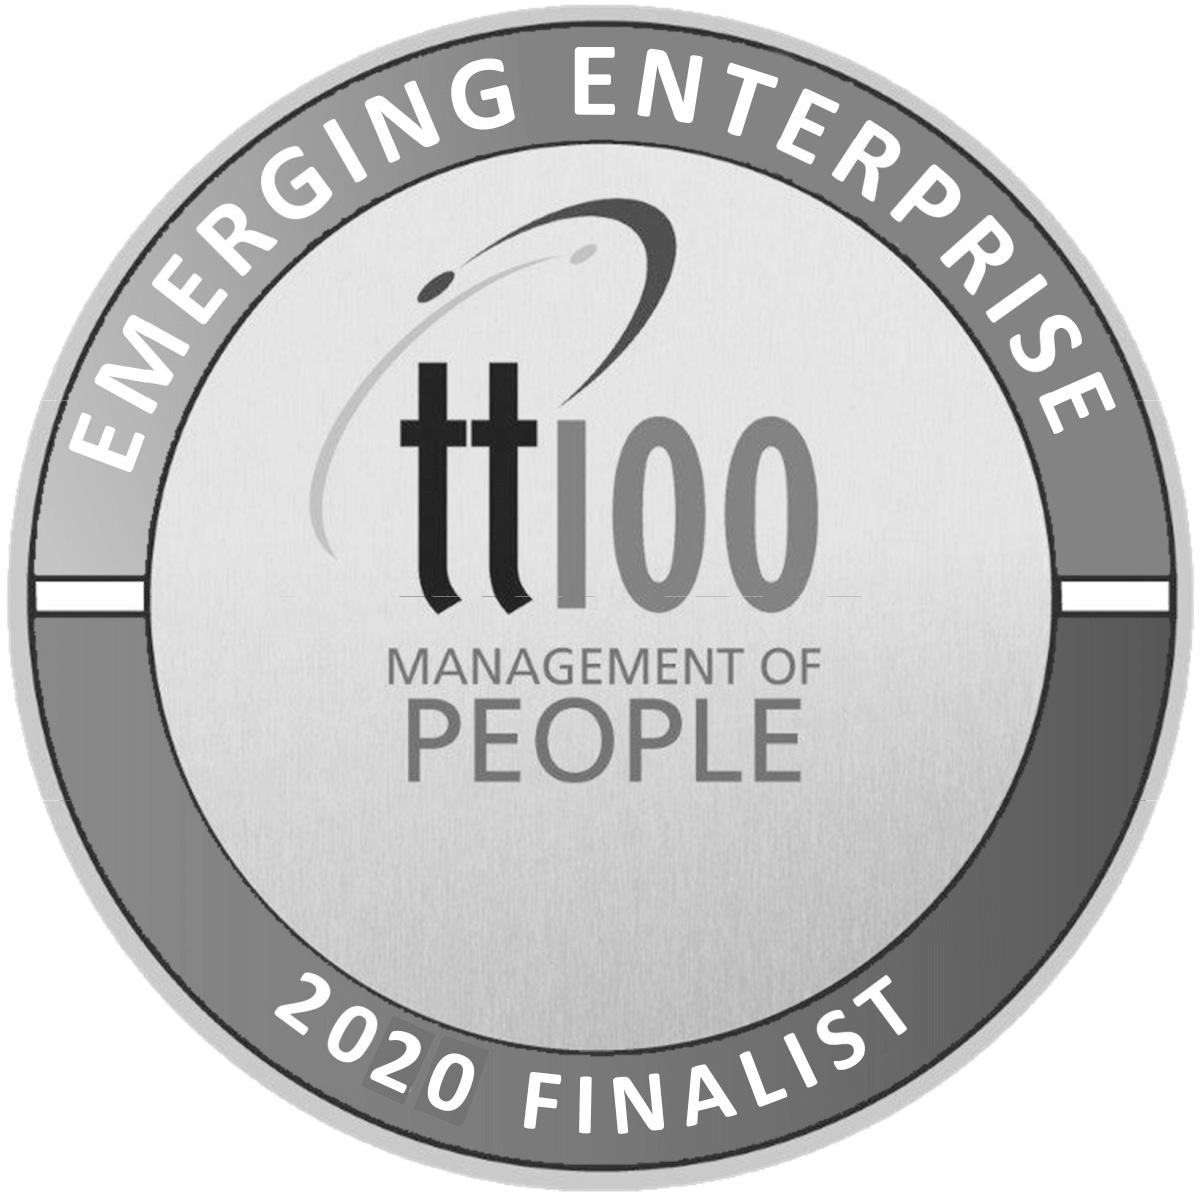 tt100-seal-management-of-people-2020-finalist